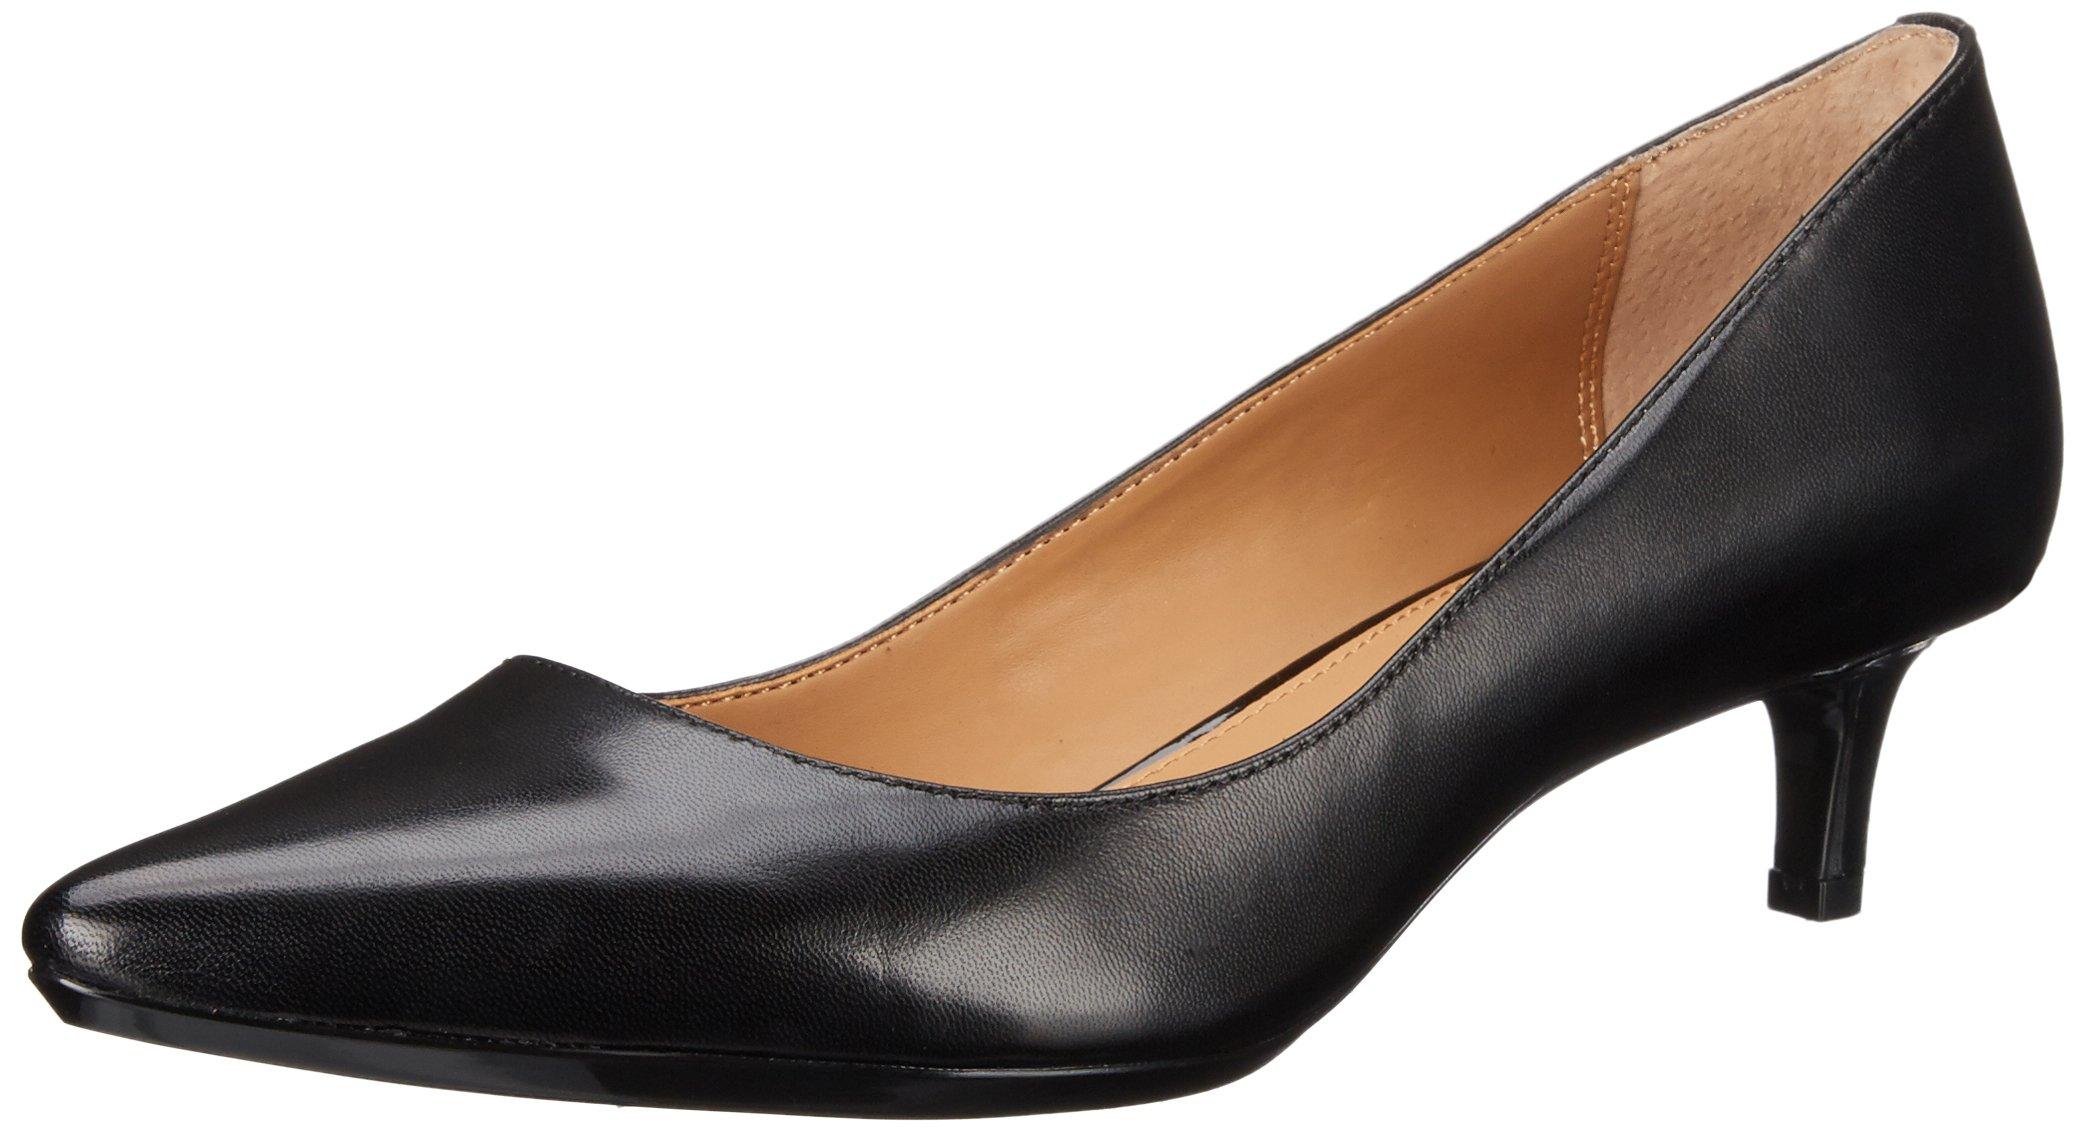 Calvin Klein Women's GABRIANNA Shoe, Black Leather, 9 Medium US